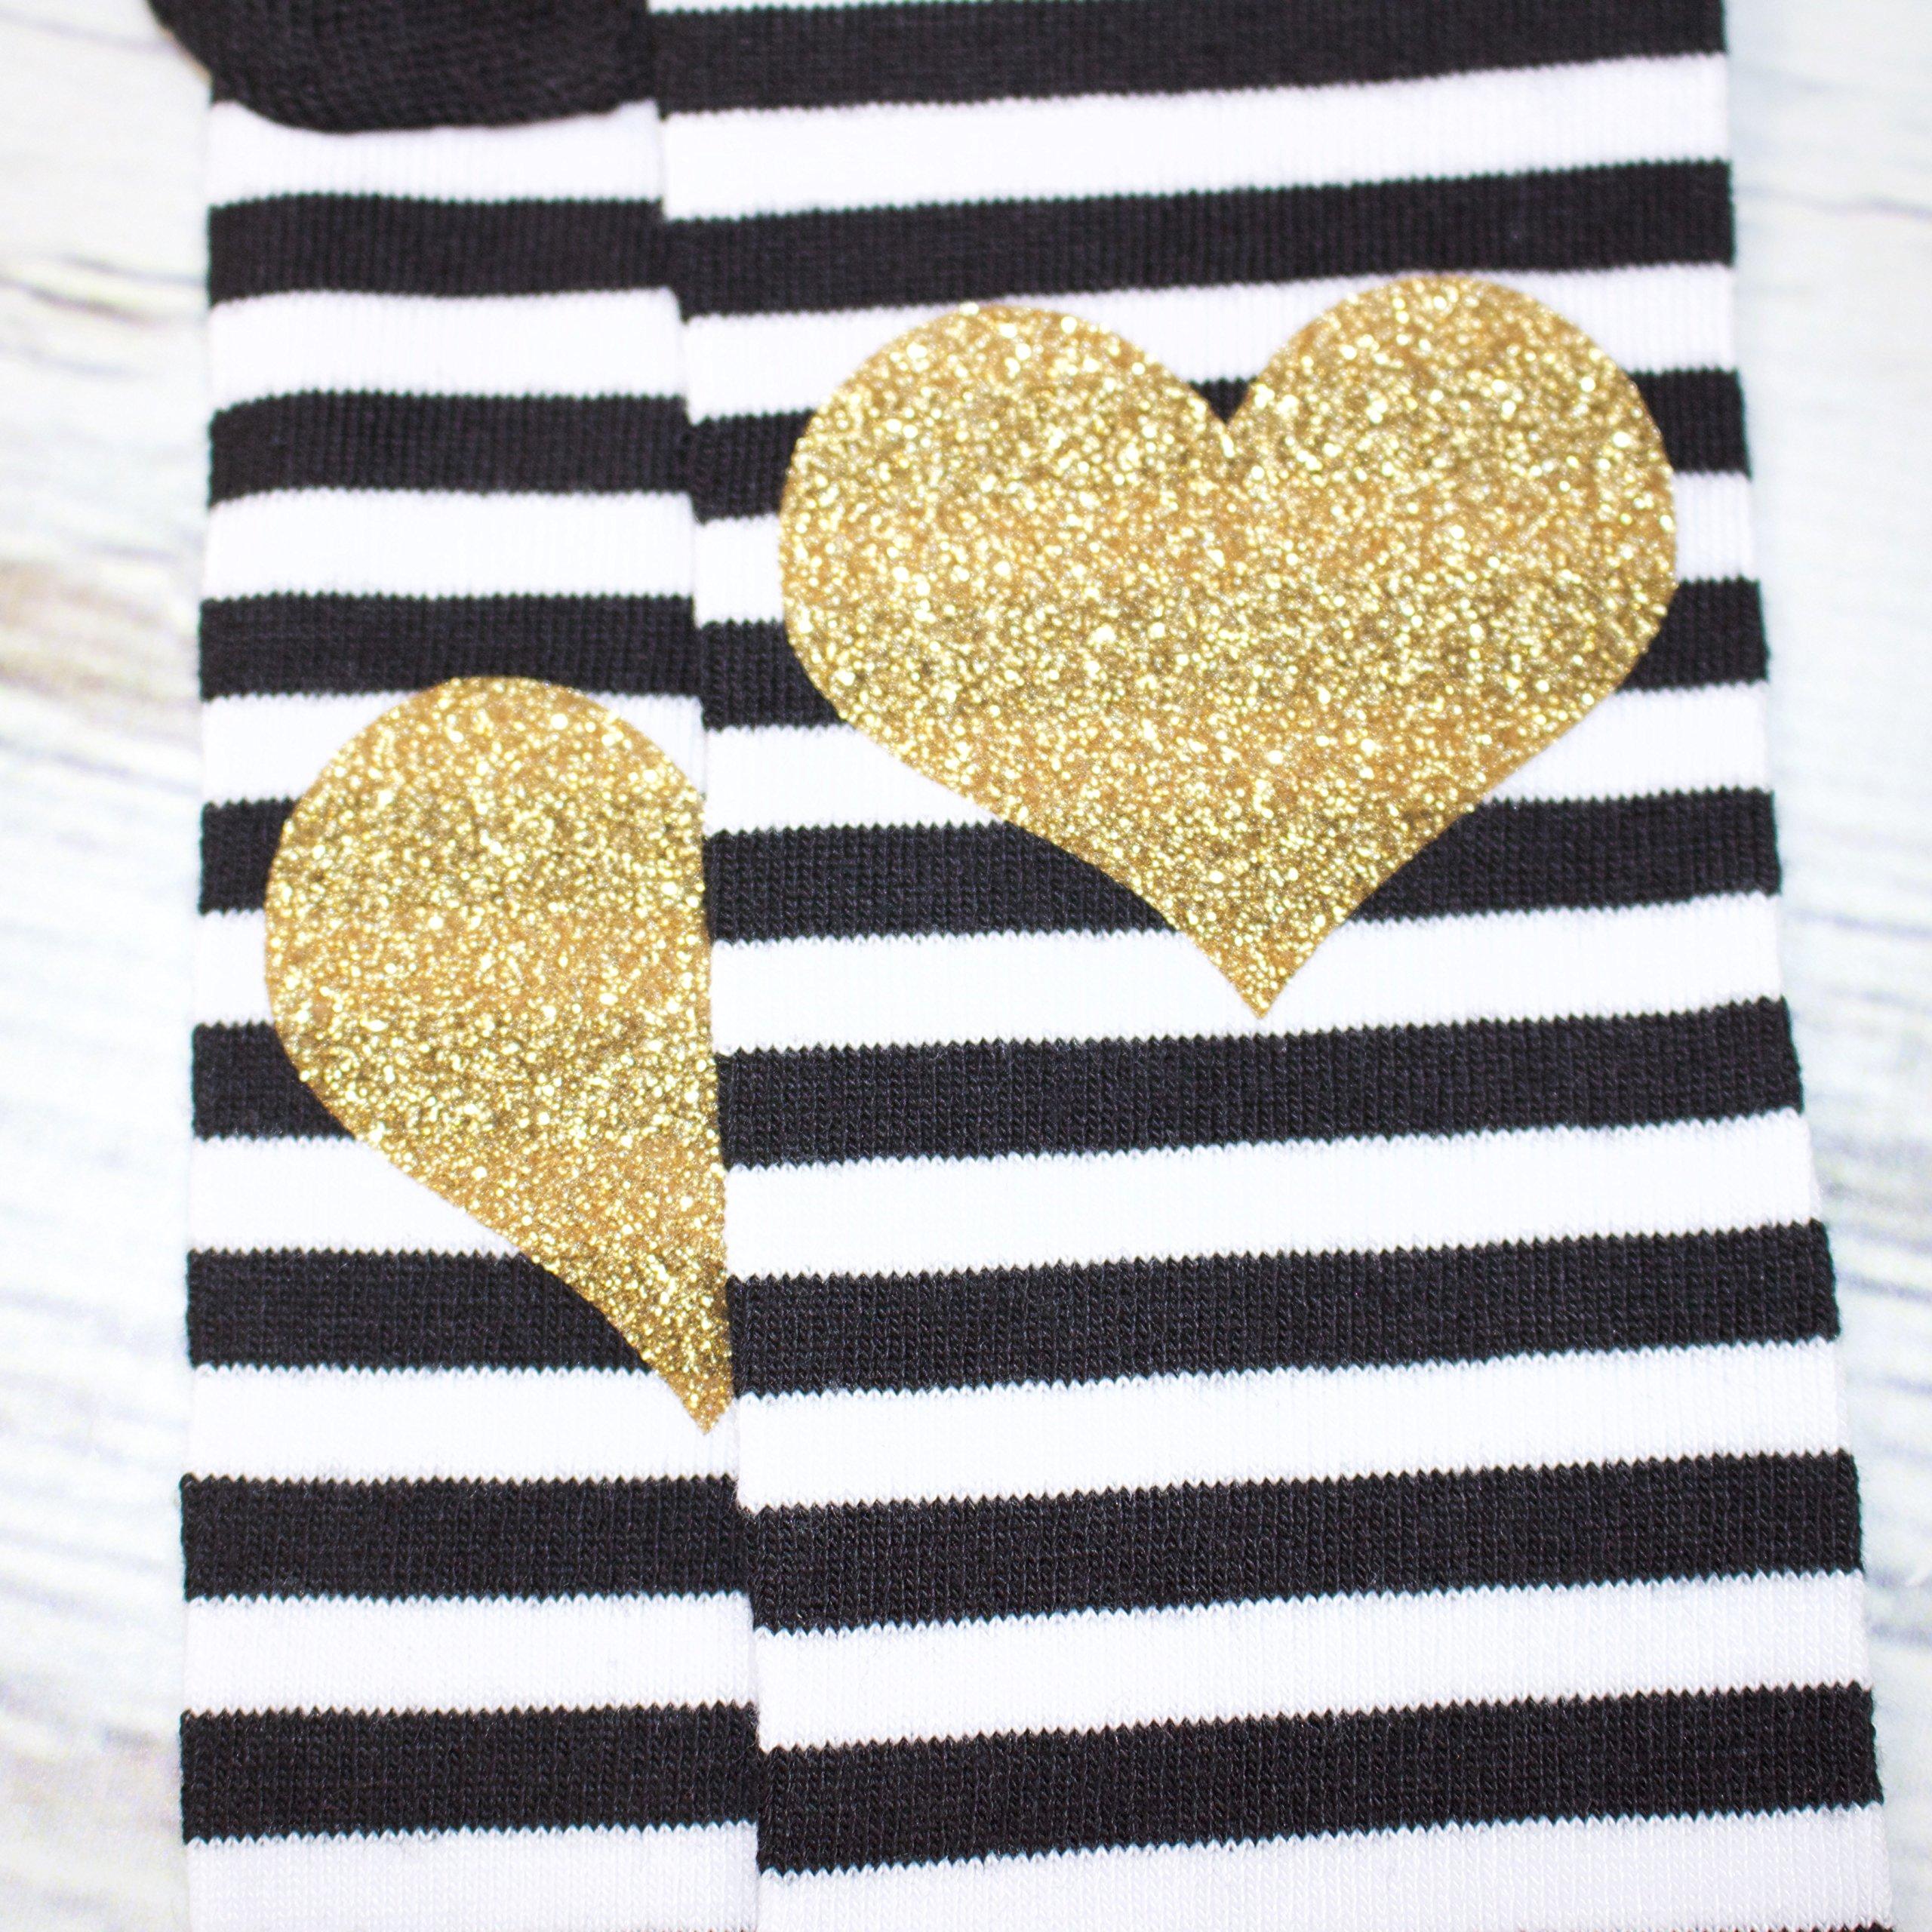 Gold Glitter Heart Black and White Stripe Ruffle Baby Leg Warmer by Olive Loves Apple (Image #3)